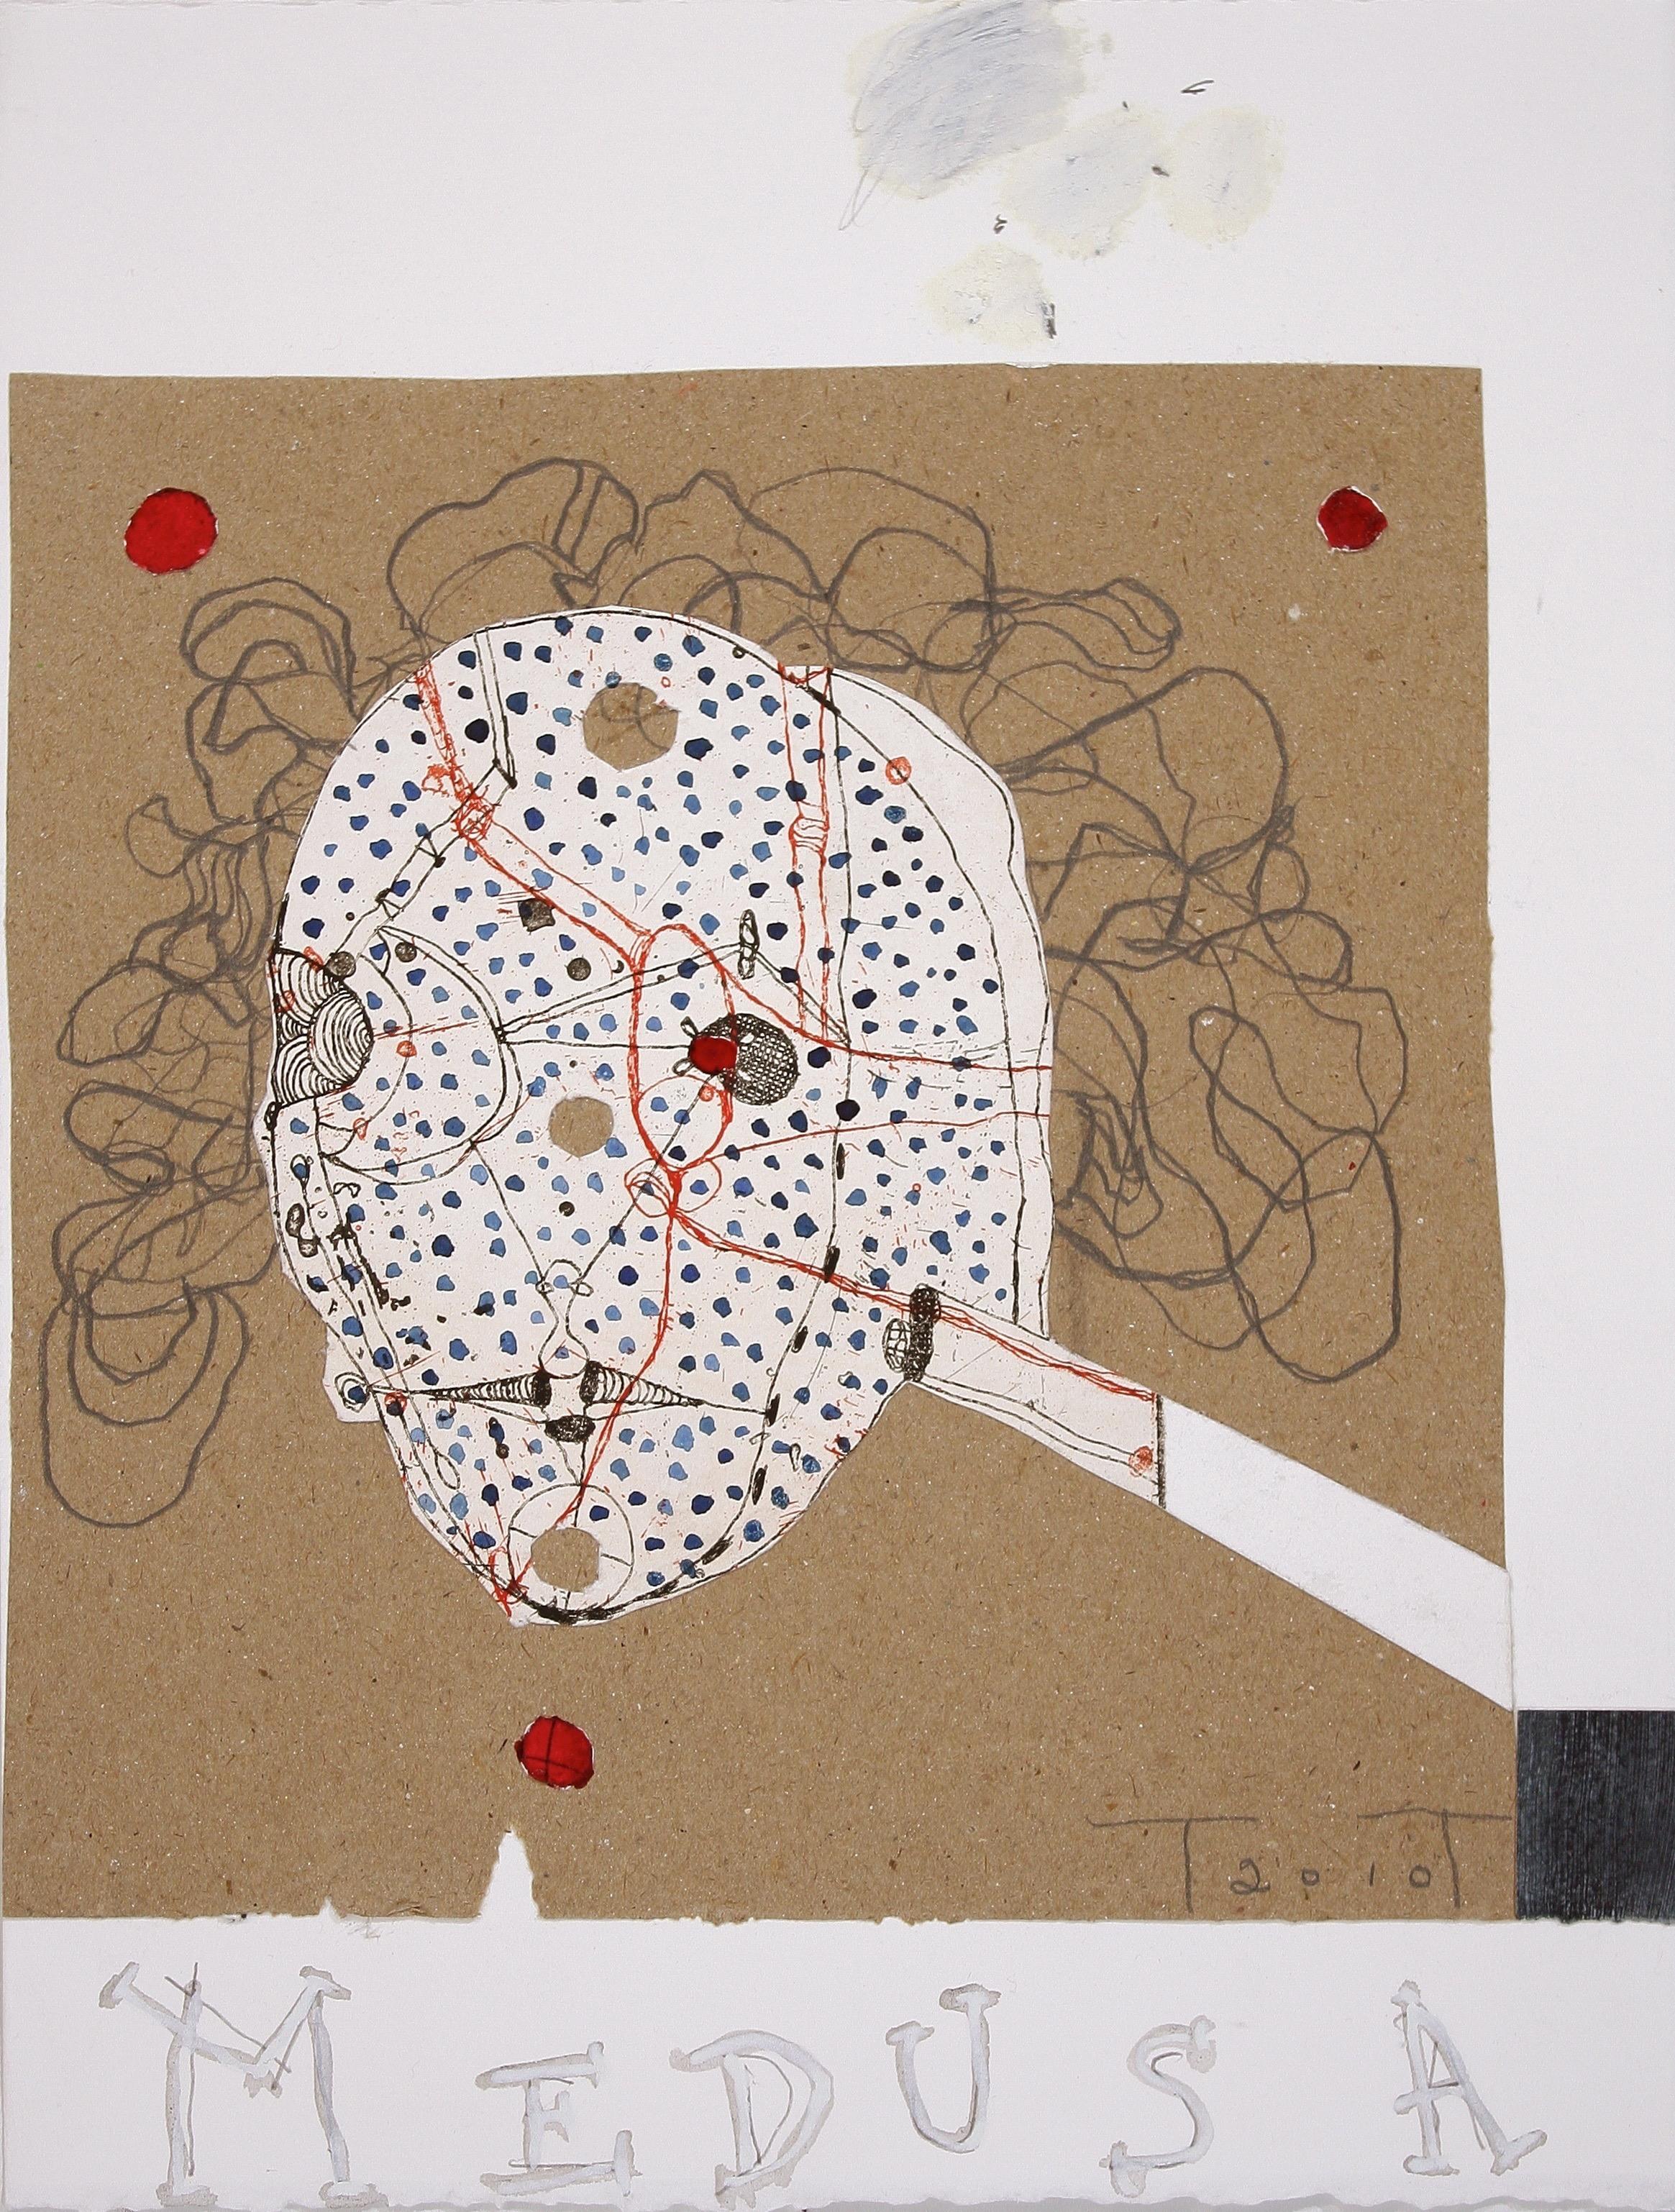 'Medusa' study, mixed media on paper, 33 X 25cm, 2010